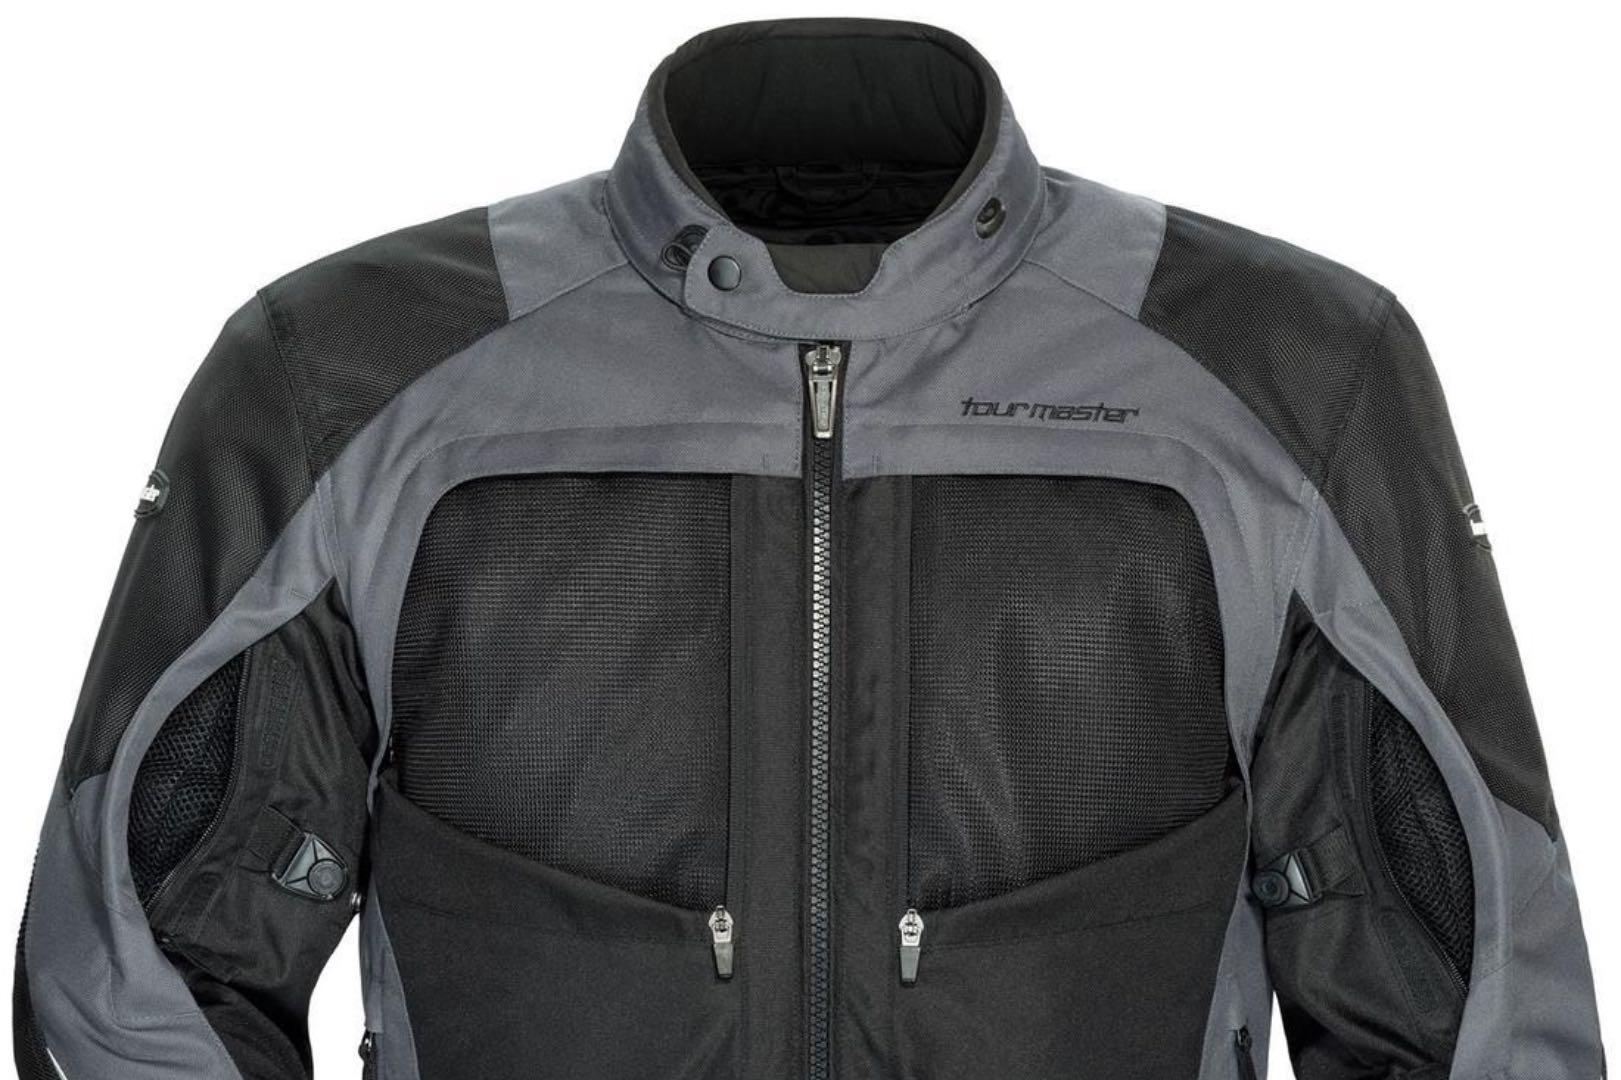 Tourmaster Pivot Jacket